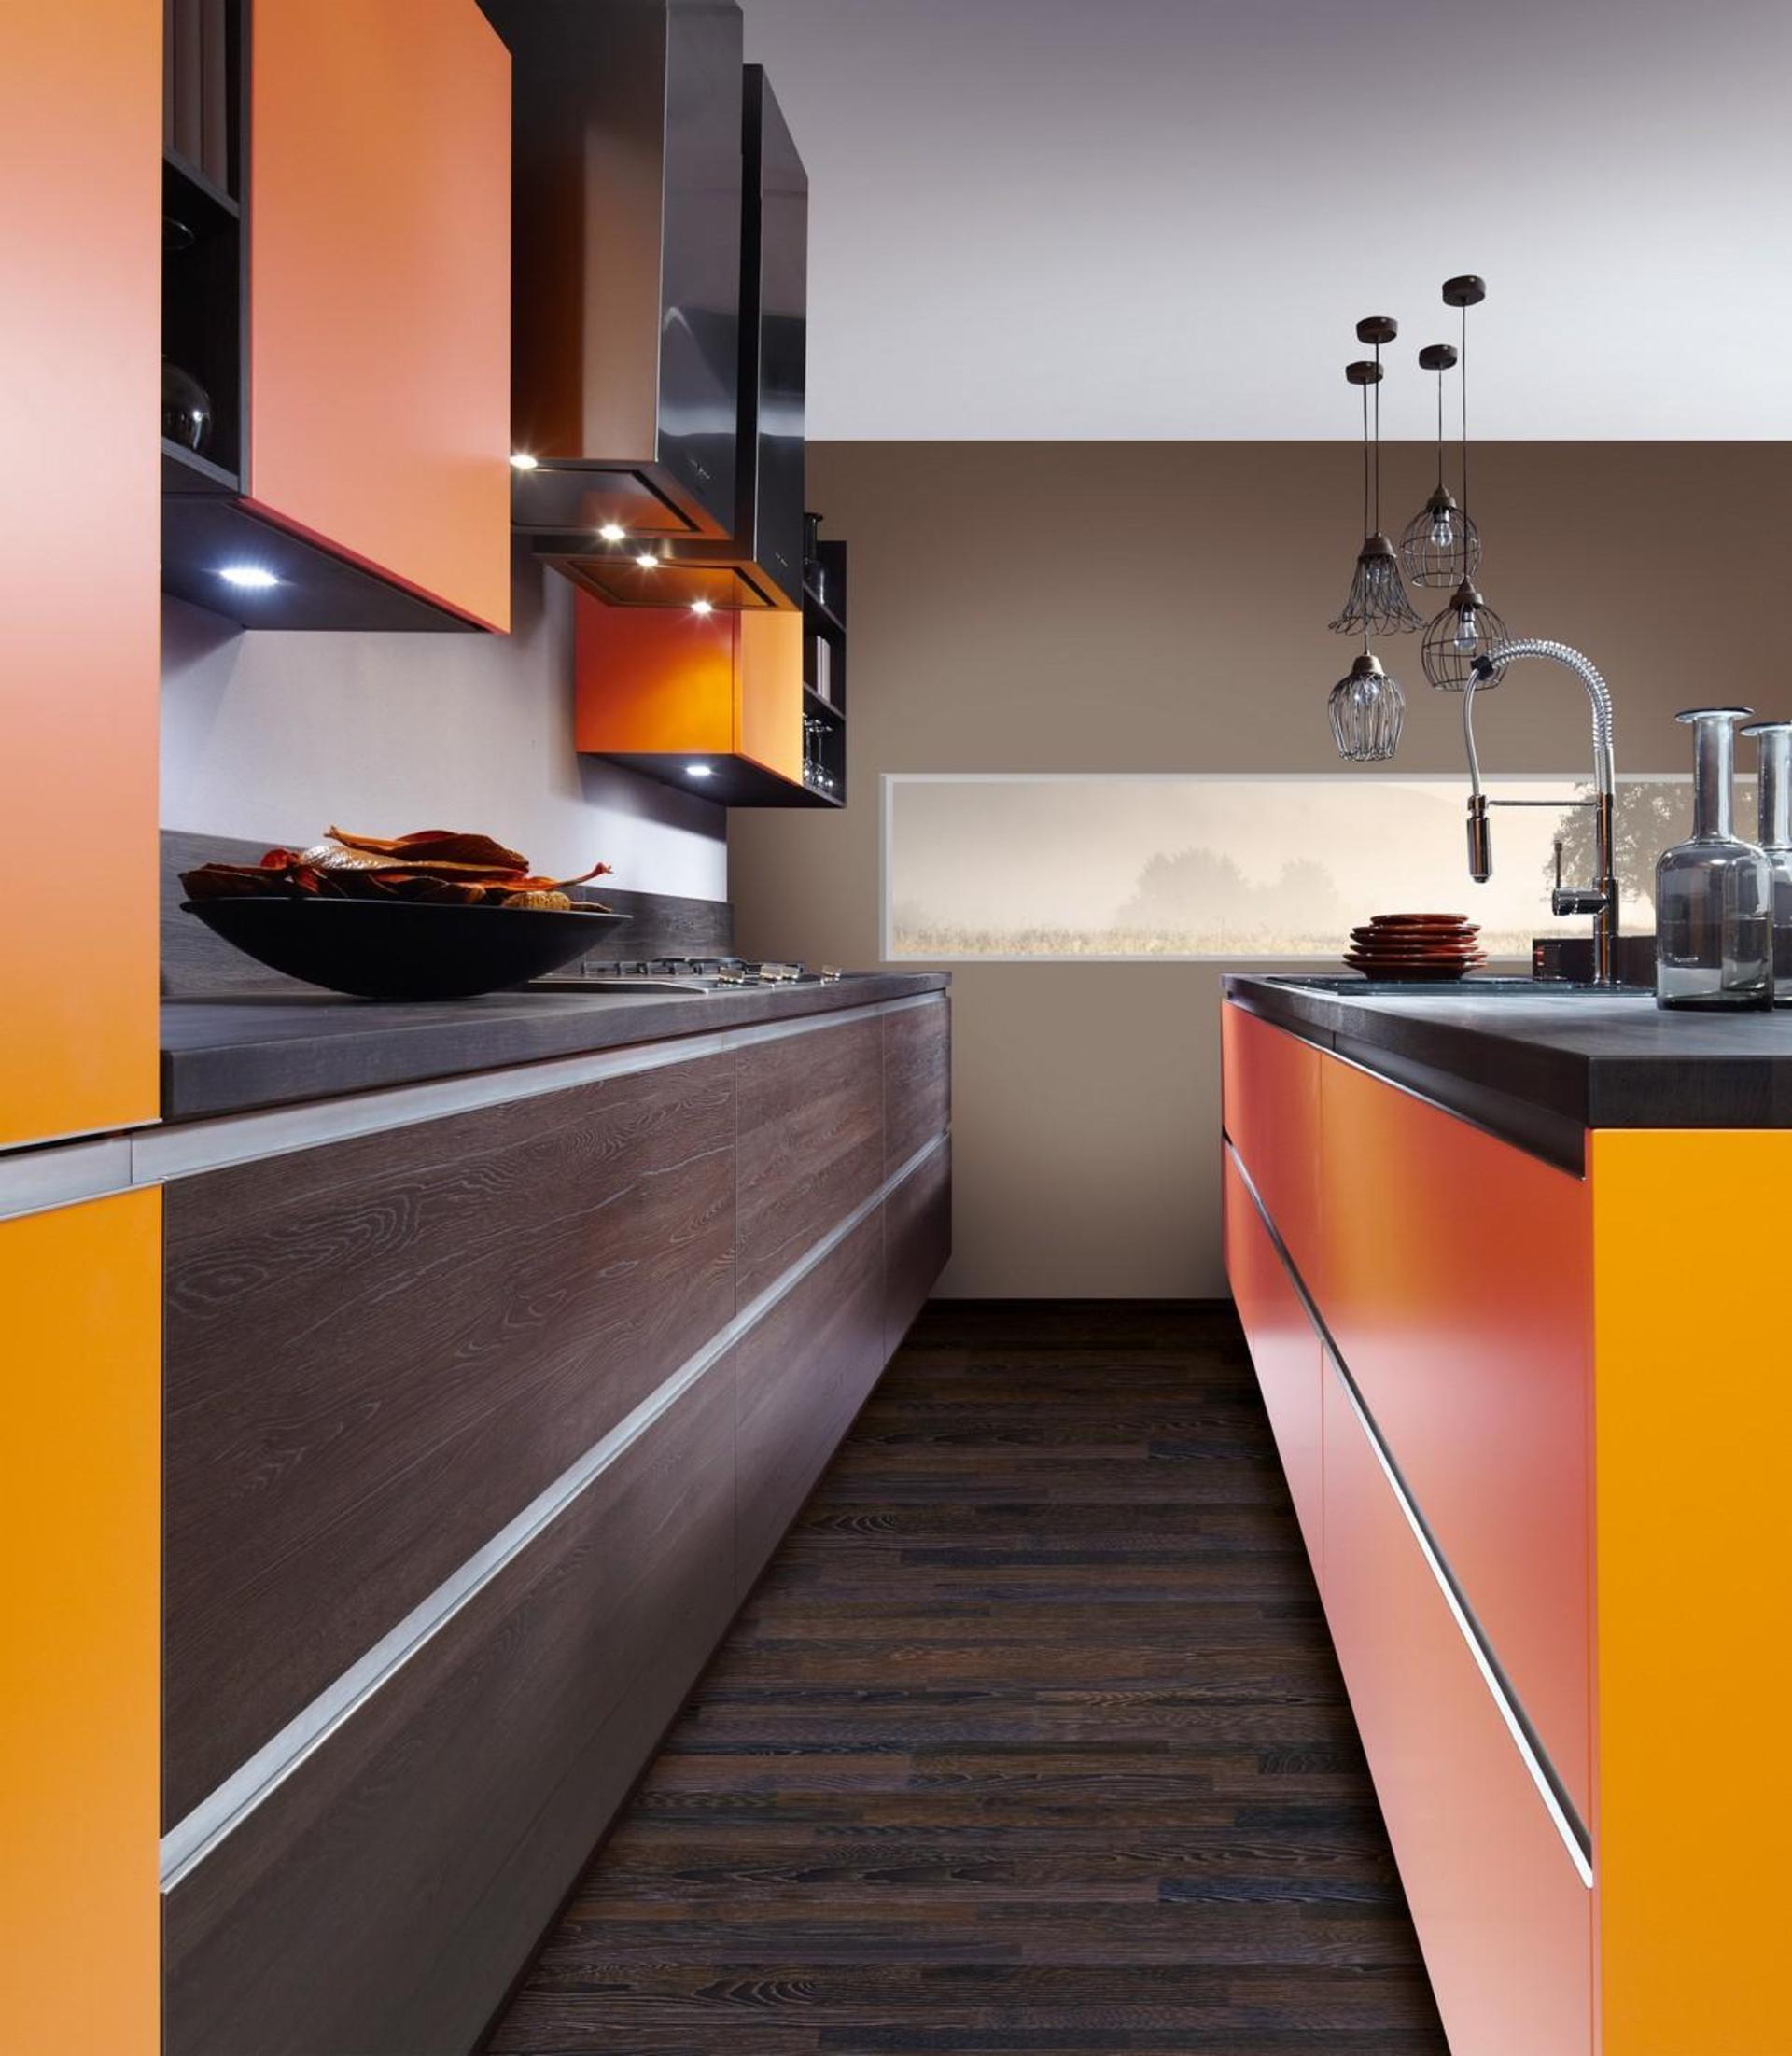 Кухня Schröder Color Orange & Sincrono Tobacco Oak фото 2